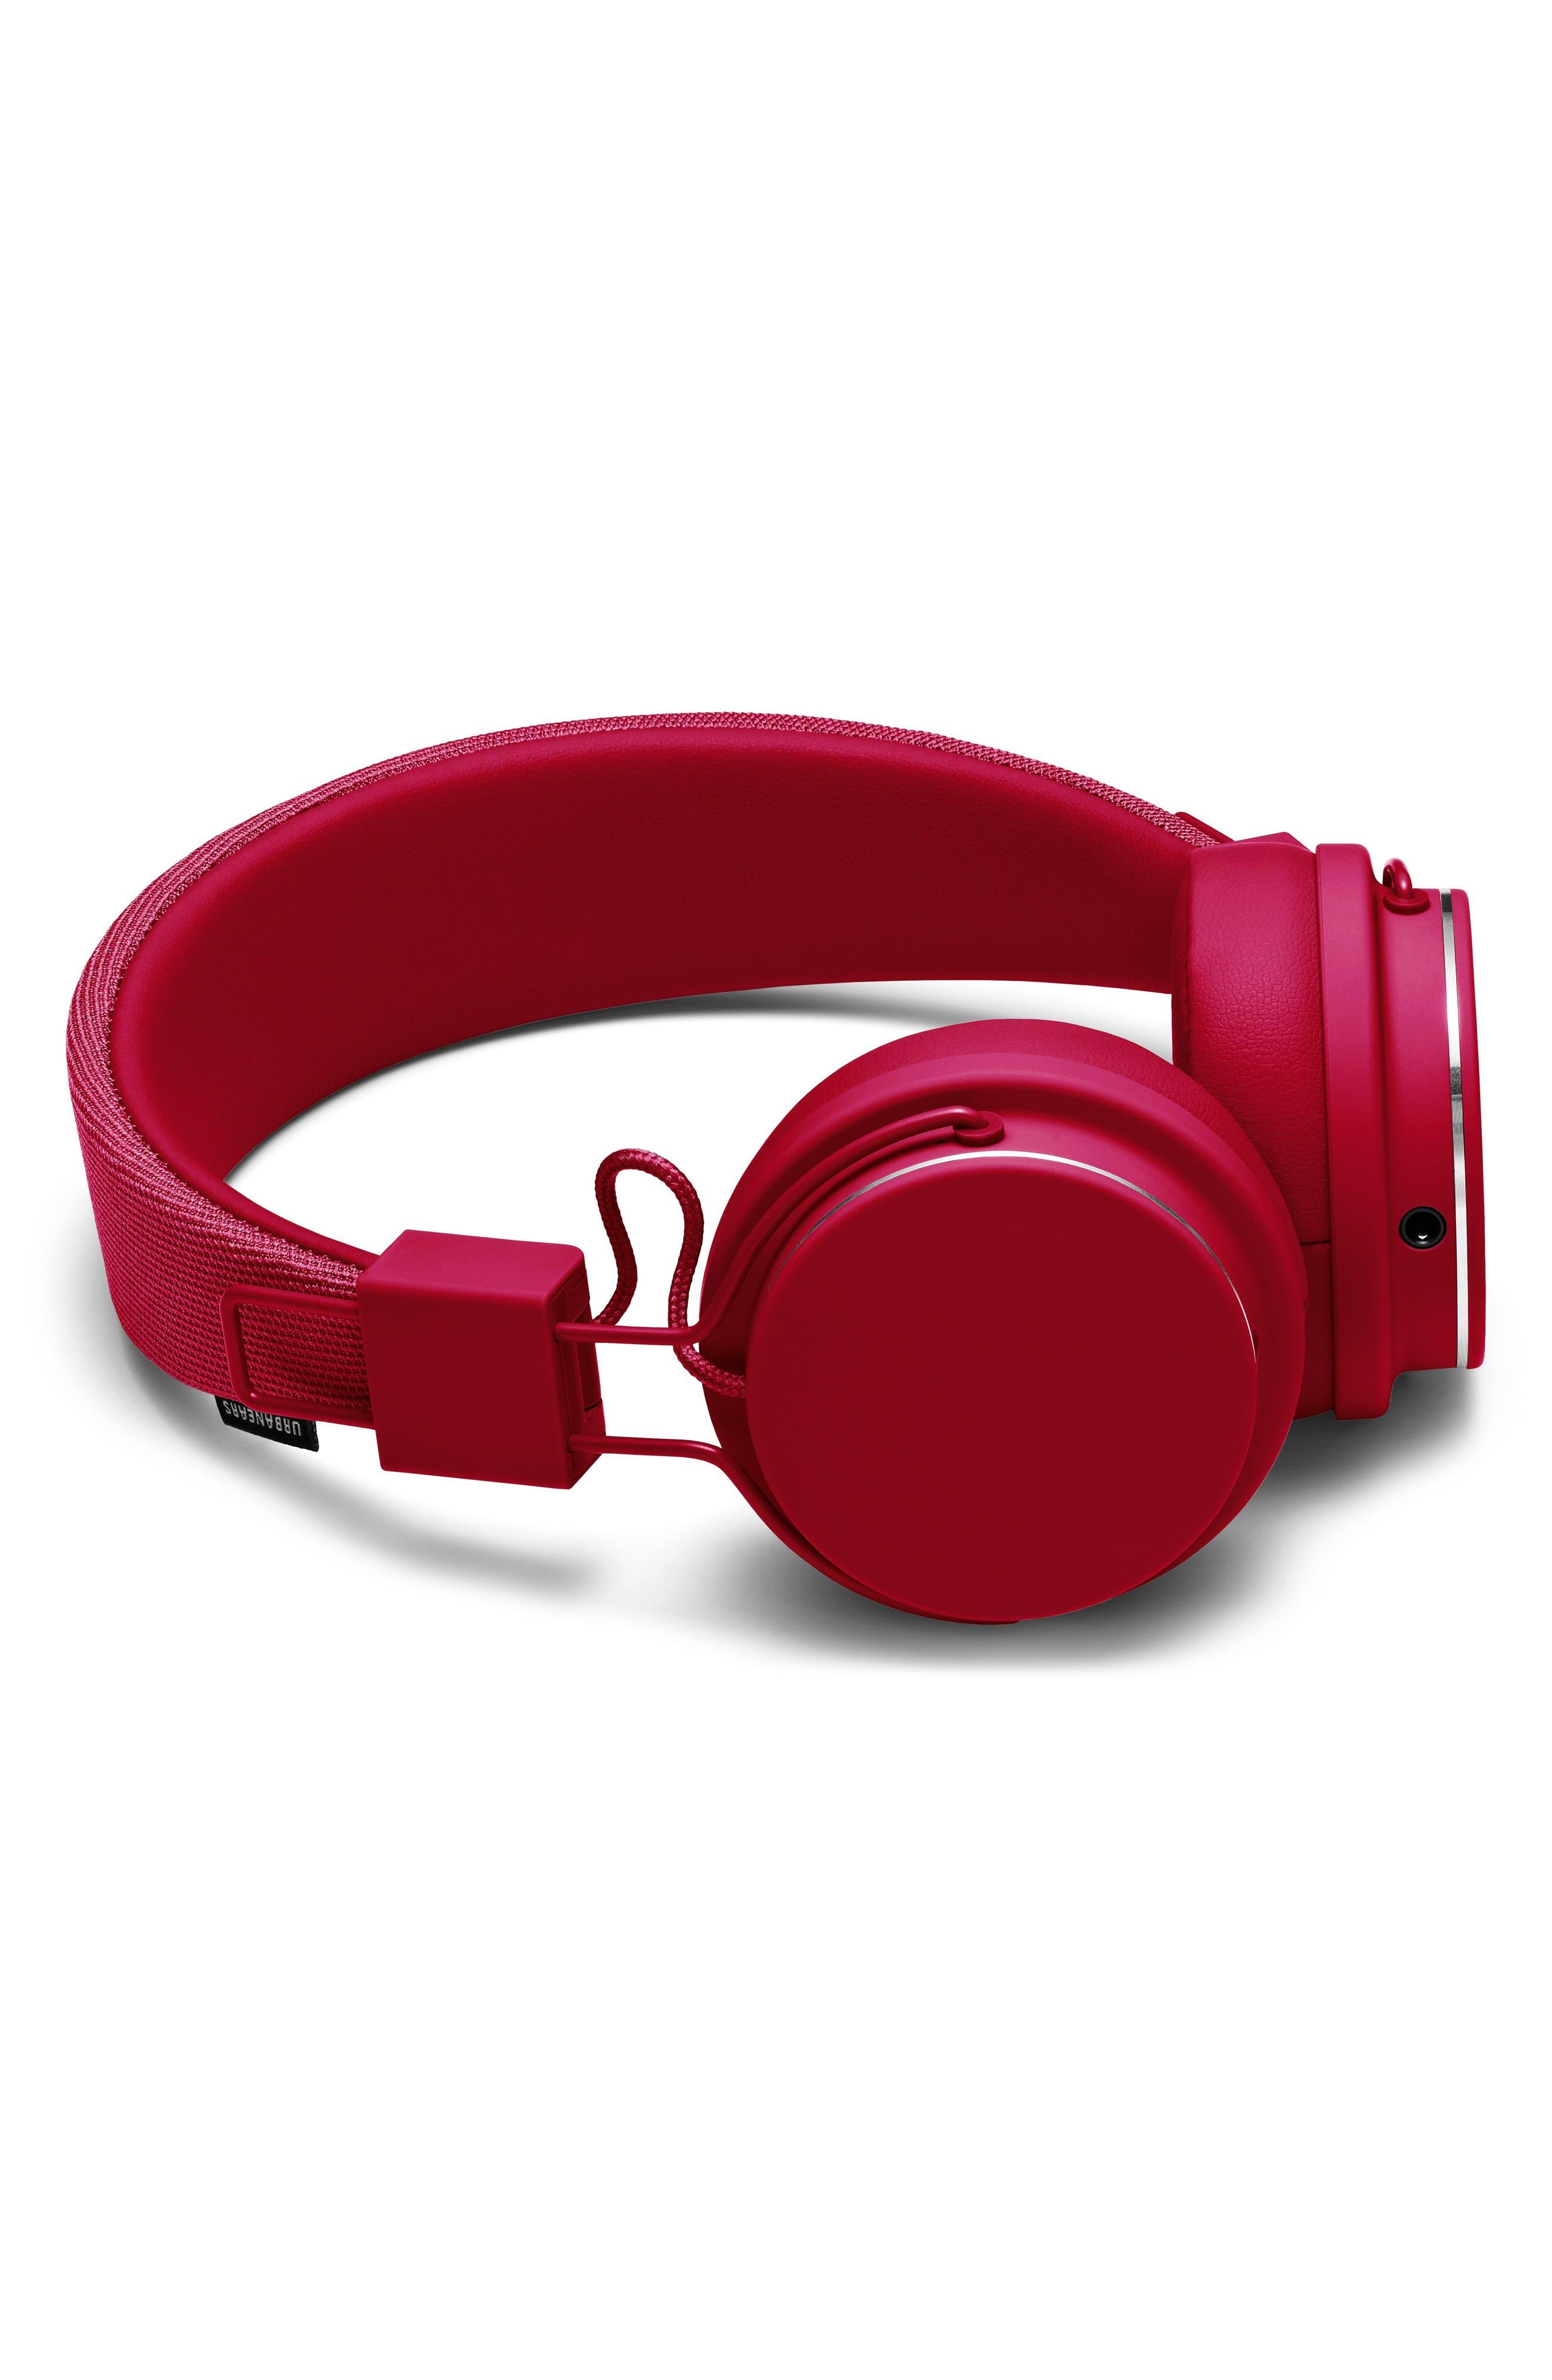 Plattan II On-Ear Headphones,                             Alternate thumbnail 2, color,                             Beryl Red